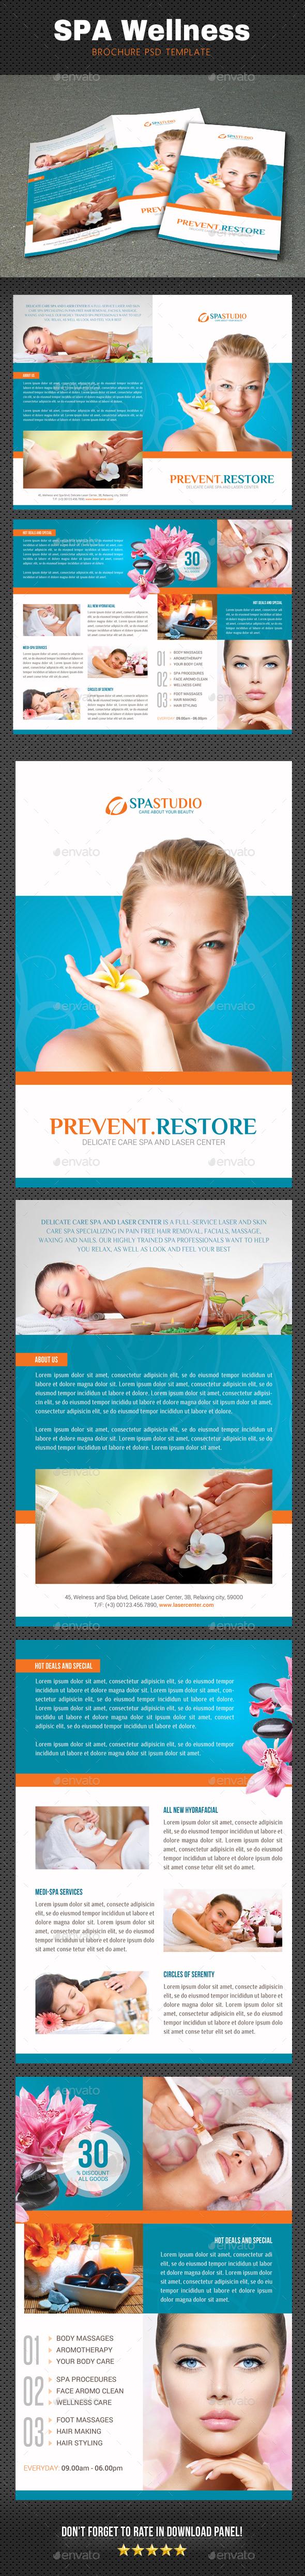 Spa Wellness Brochure 2 - Brochures Print Templates